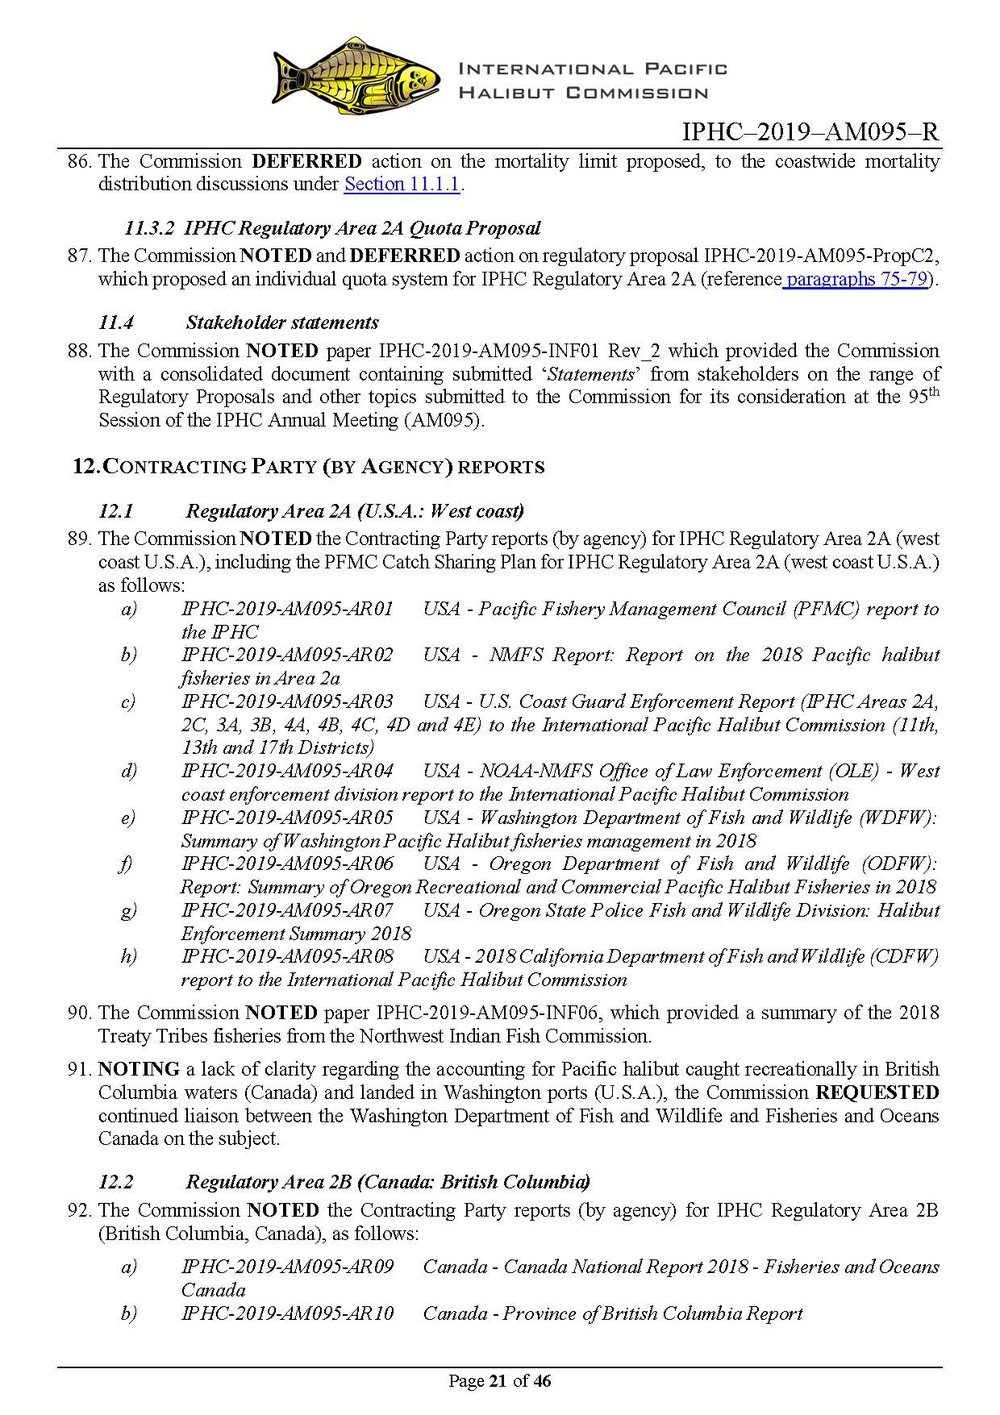 iphc-2019-am095-r_Page_21.jpg